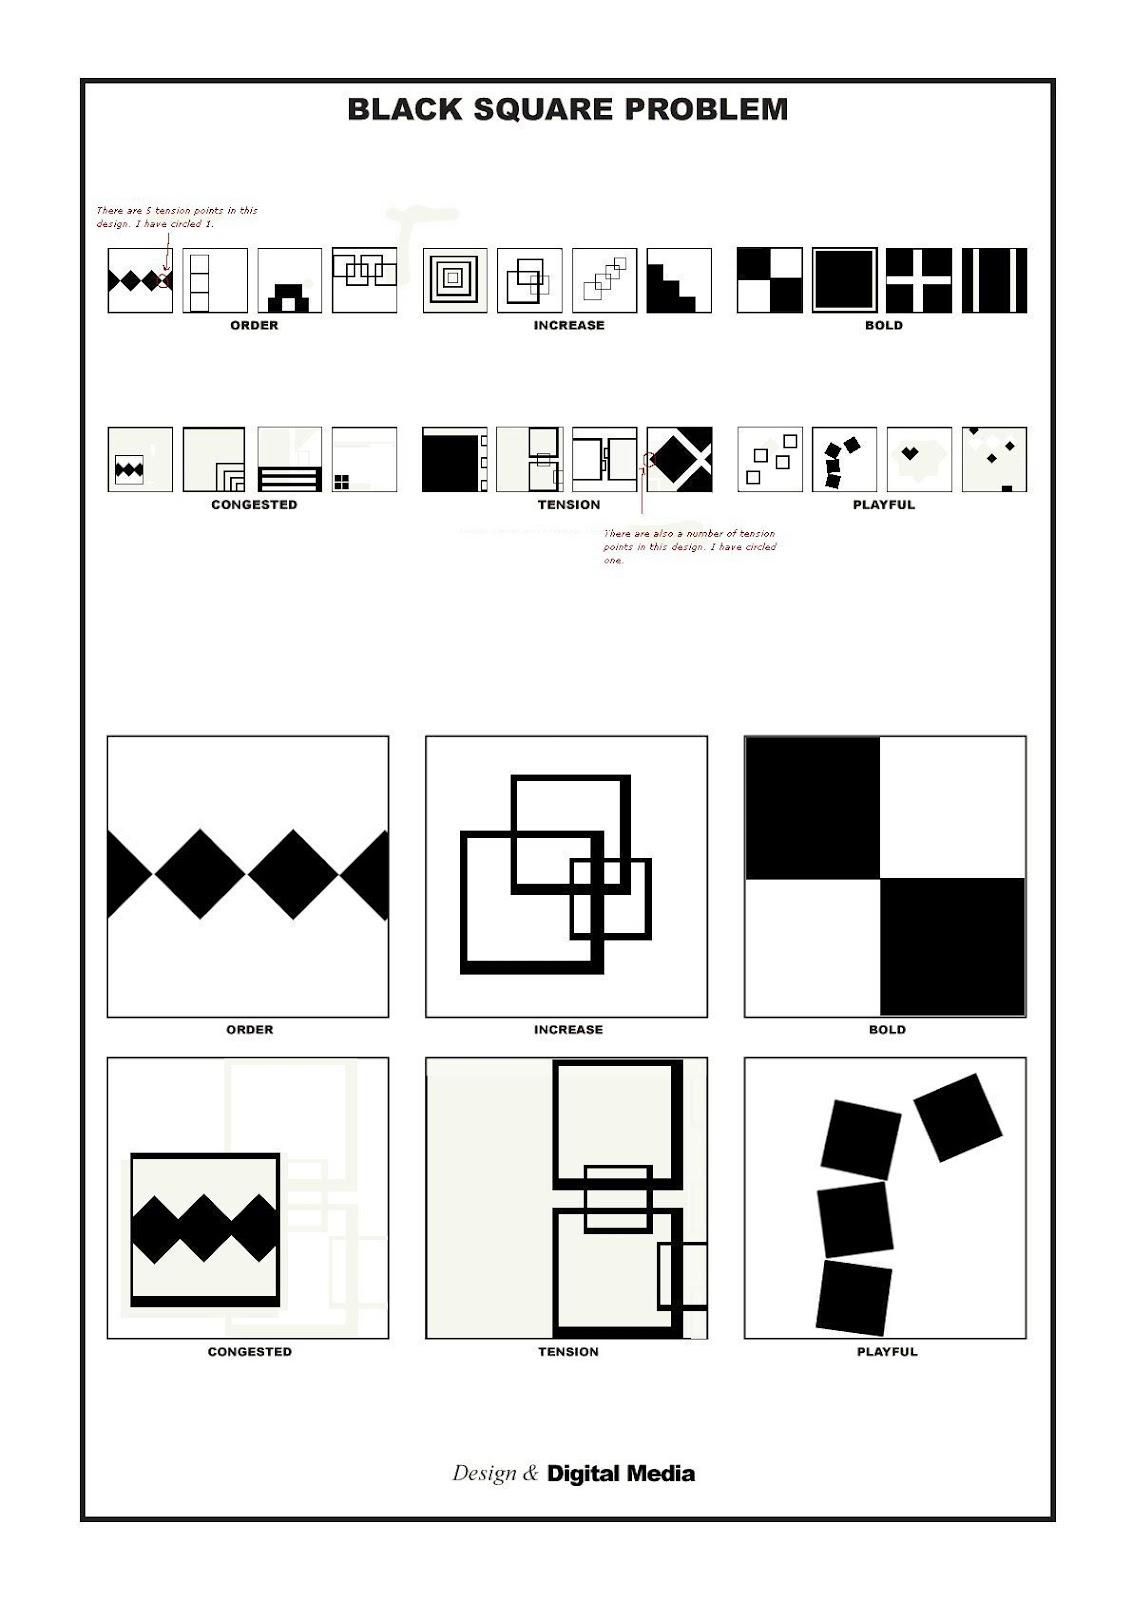 Black Square Problem | Cassidy's Space